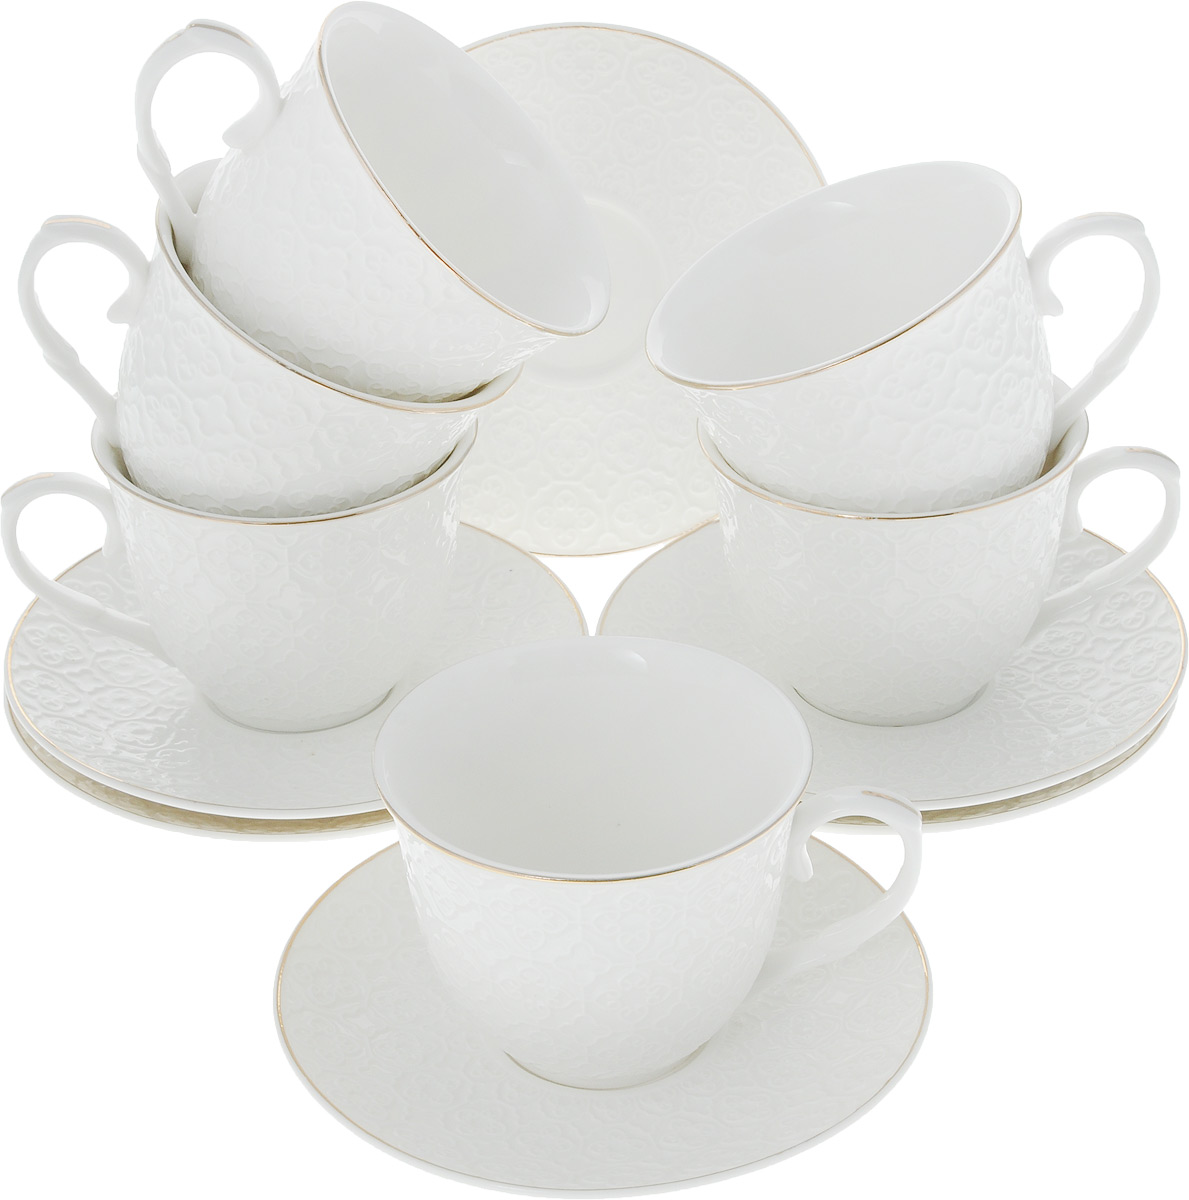 Сервиз чайный Loraine, 12 предметов. 26504 чайный сервиз 23 предмета на 6 персон bavaria кёльн b xw213y 23